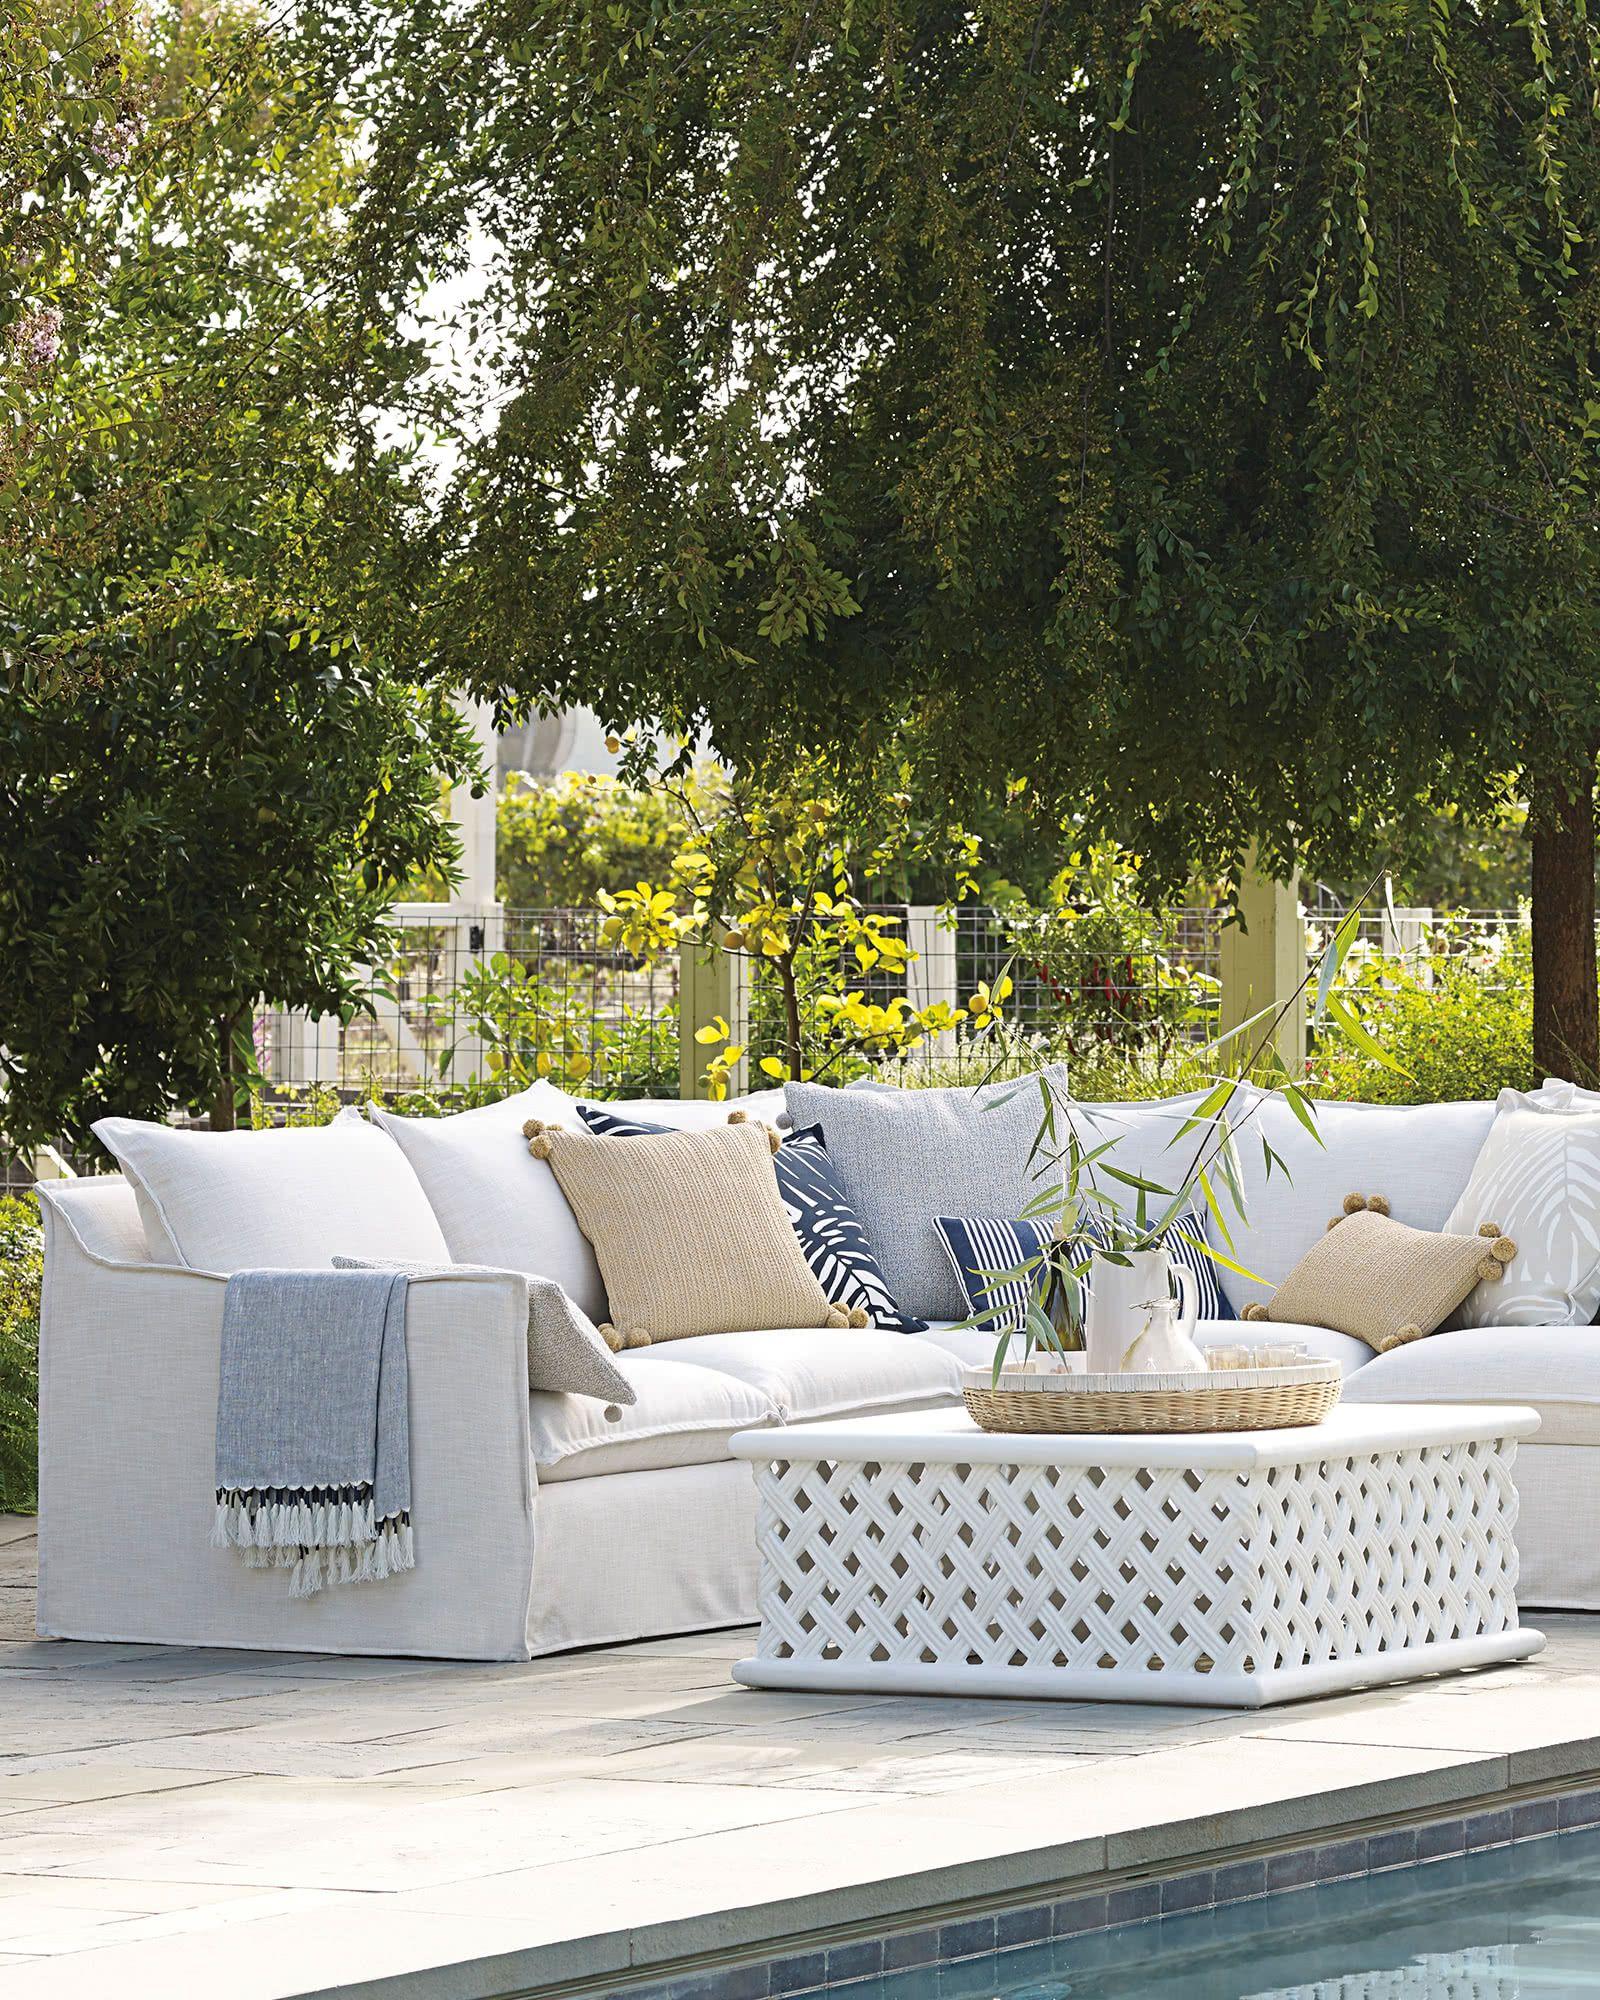 Anacapa Square Coffee Table Garden Furniture Design Garden Furniture Inspiration Diy Garden Furniture